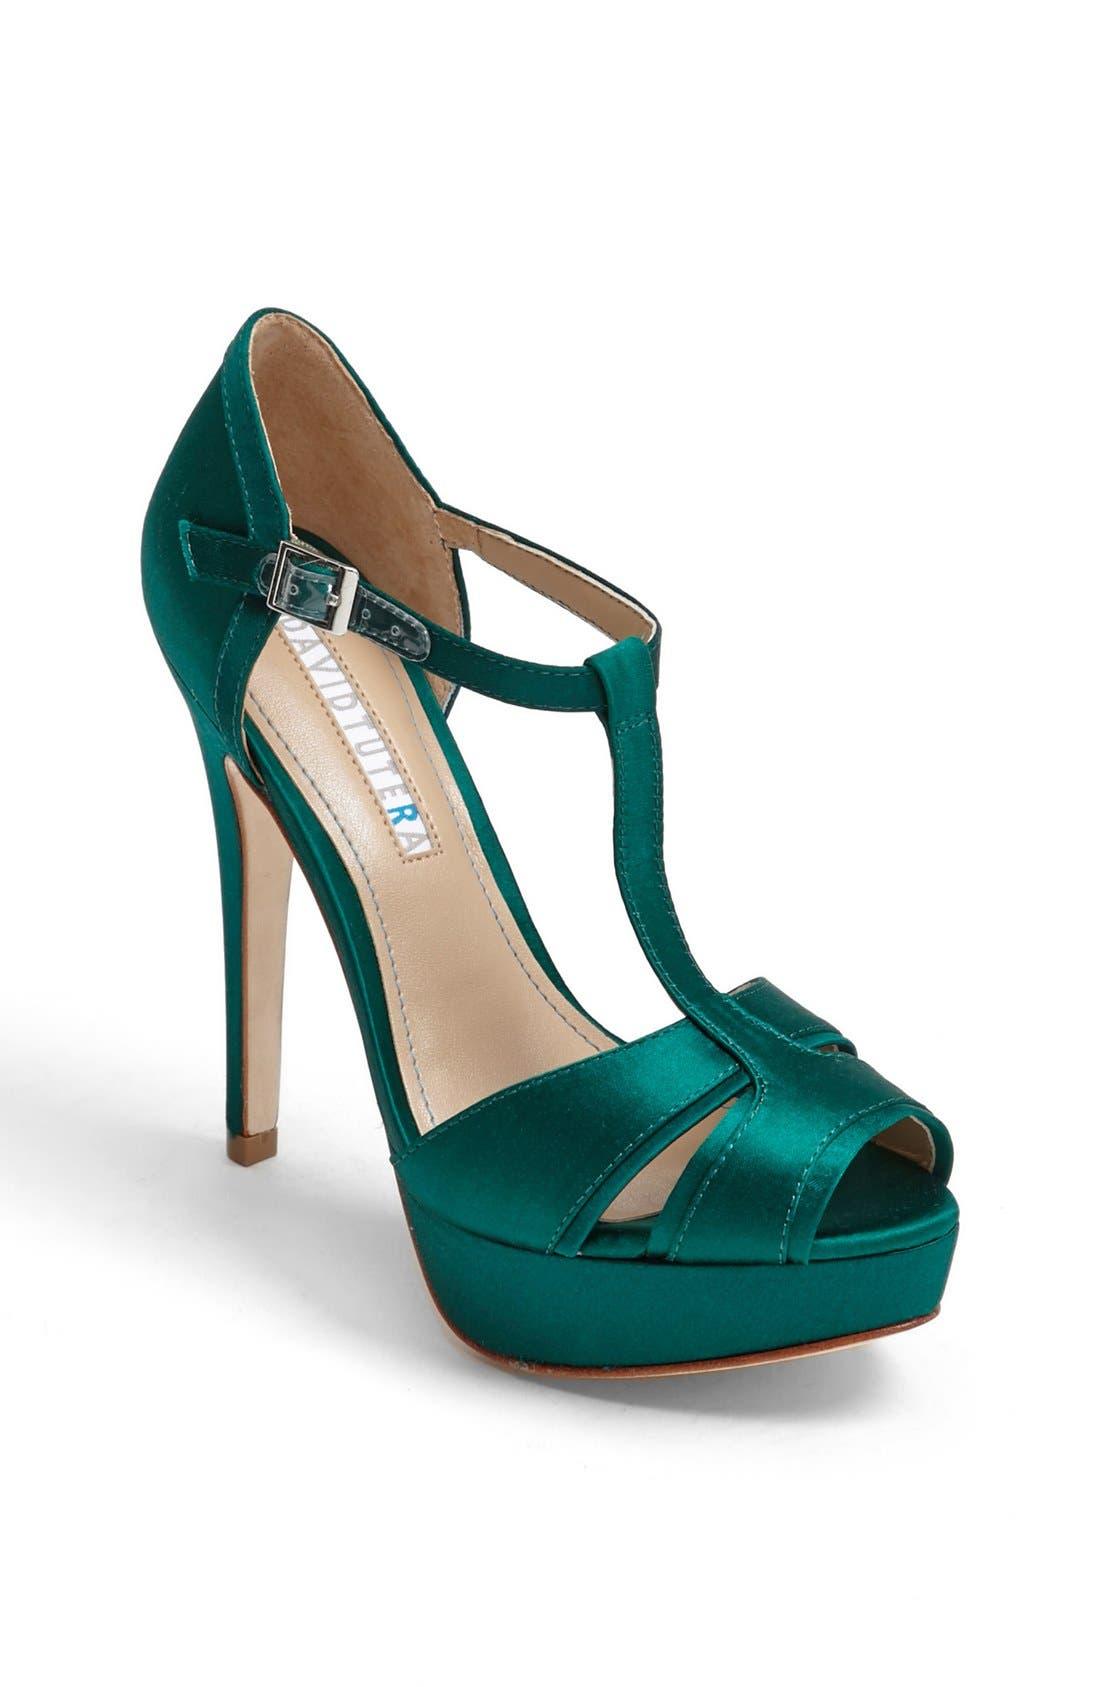 Alternate Image 1 Selected - David Tutera 'Joy' Sandal (Online Only Color)